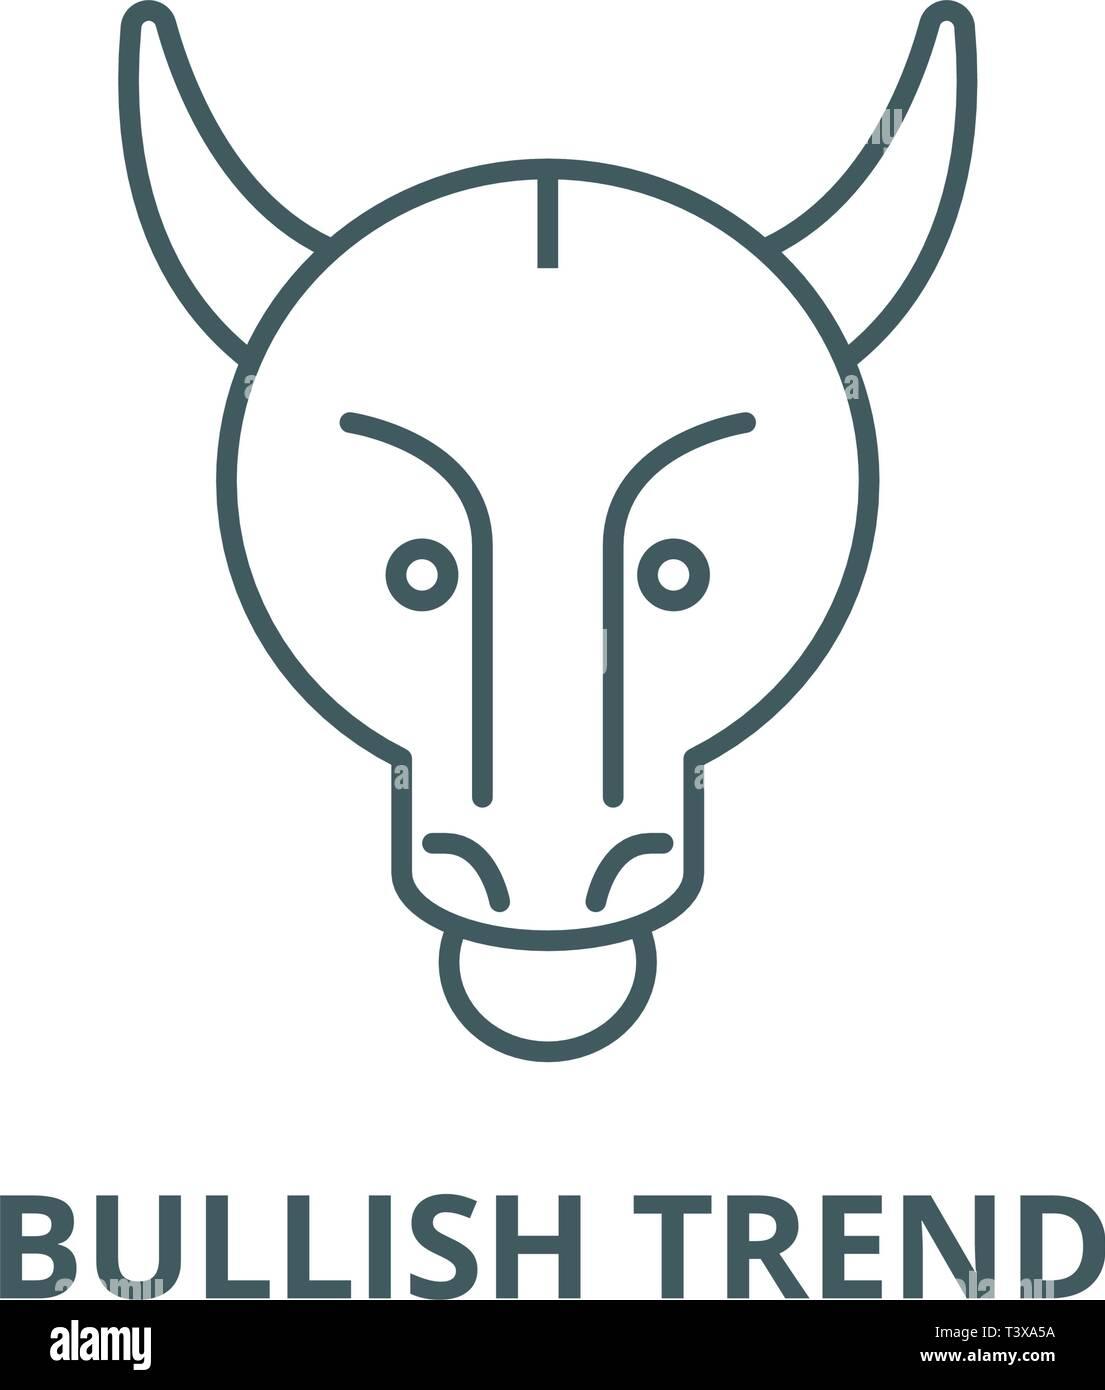 Bullish trend line icon, vector. Bullish trend outline sign, concept symbol, flat illustration Stock Vector